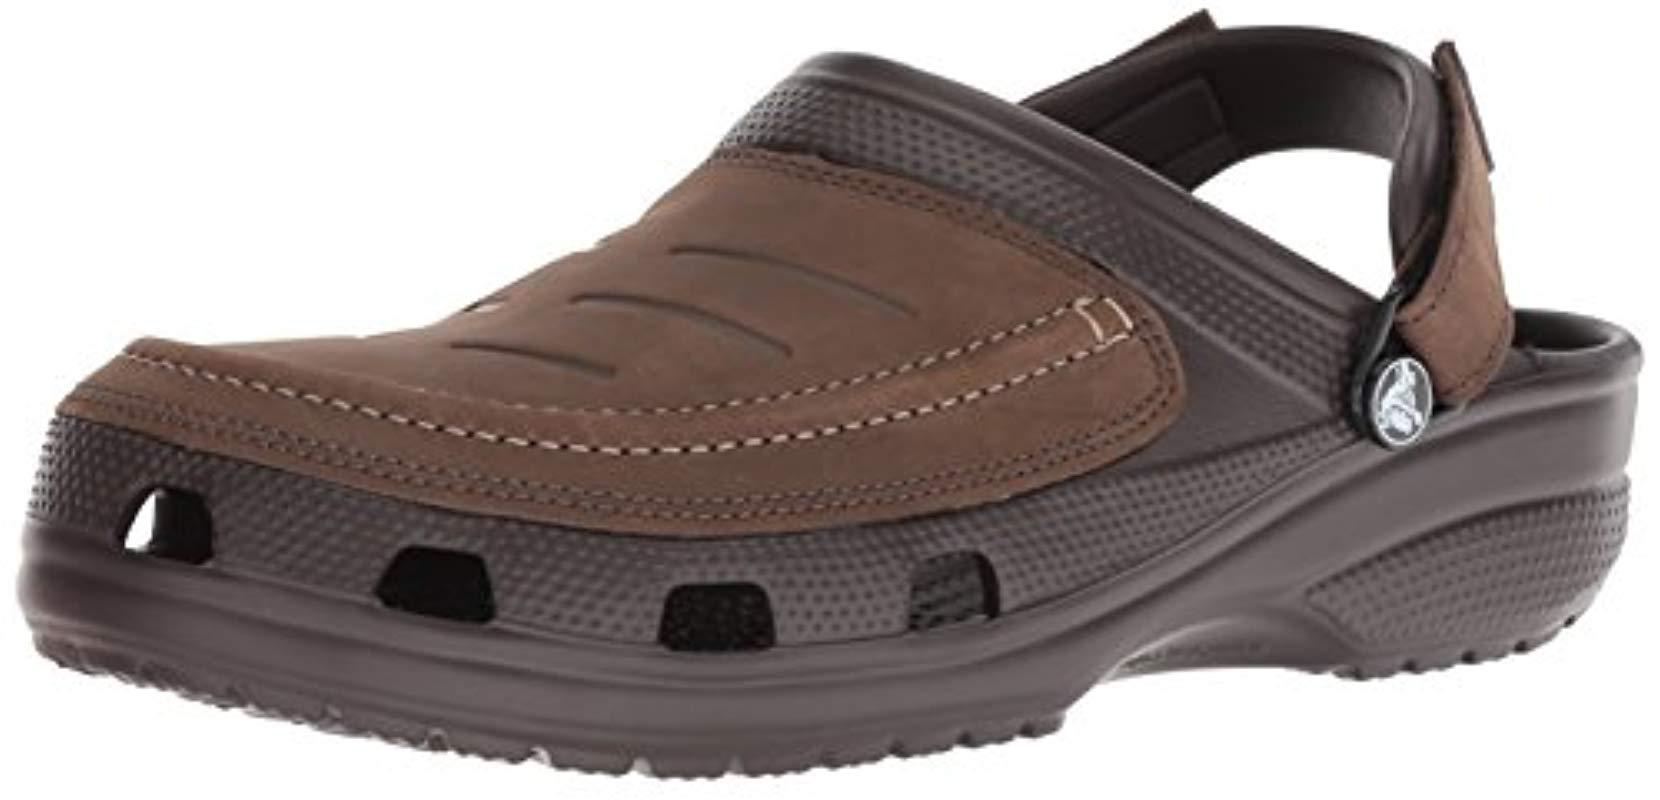 0195c39370830 Lyst - Crocs™ Yukon Vista Clog for Men - Save 2%